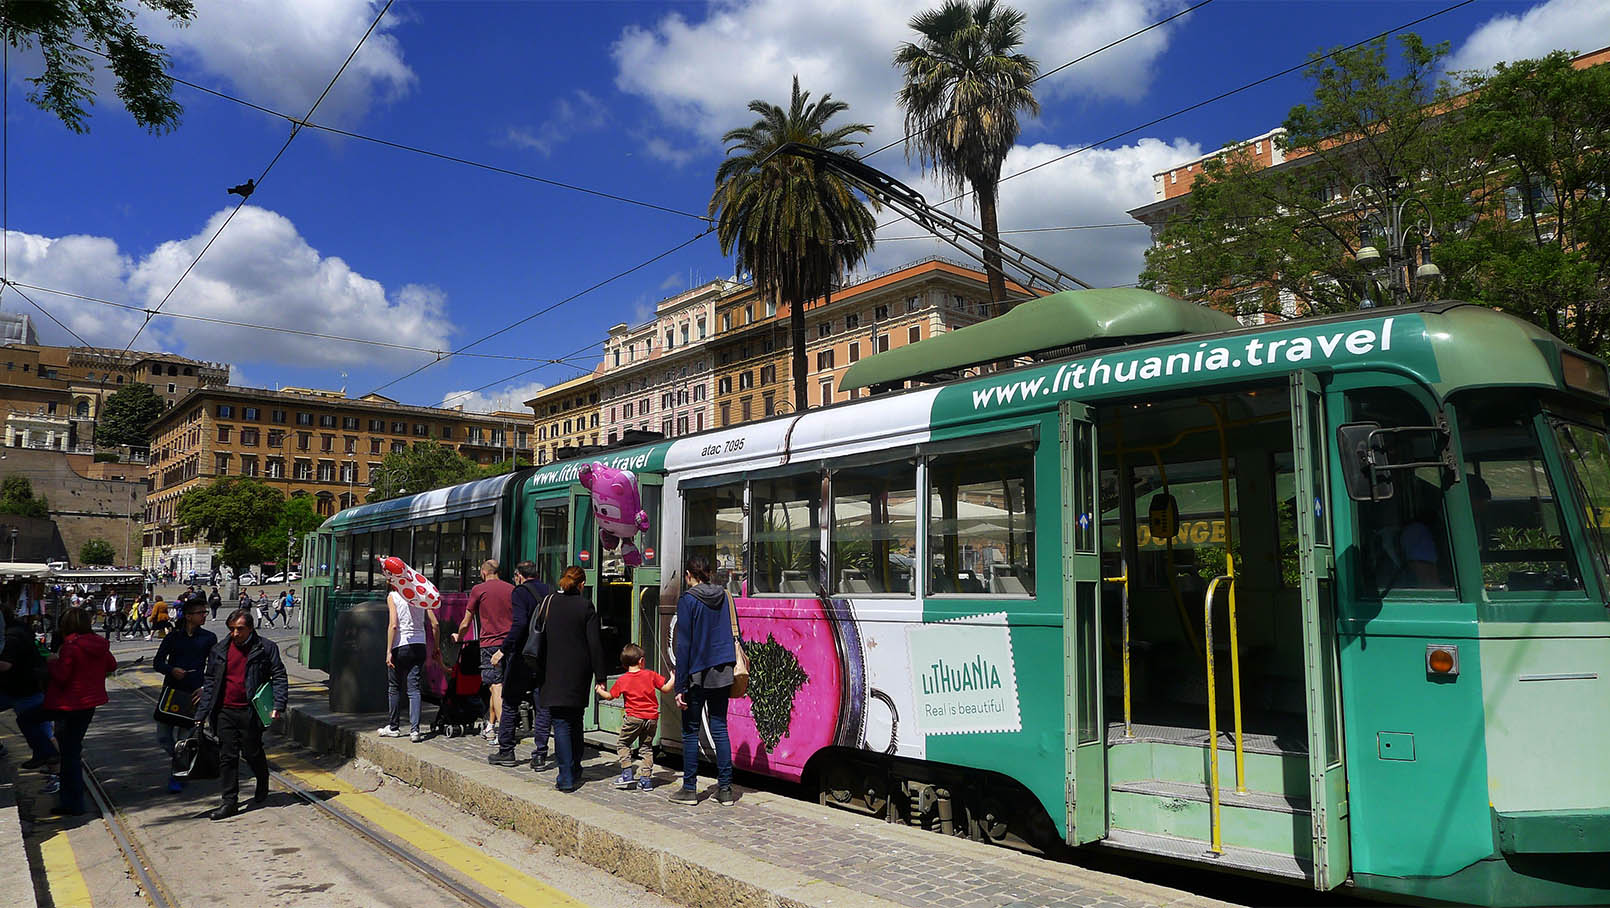 https://www.promotionmagazine.it/wp/wp-content/uploads/2017/05/LITUANIA_tram-Roma-1.jpg